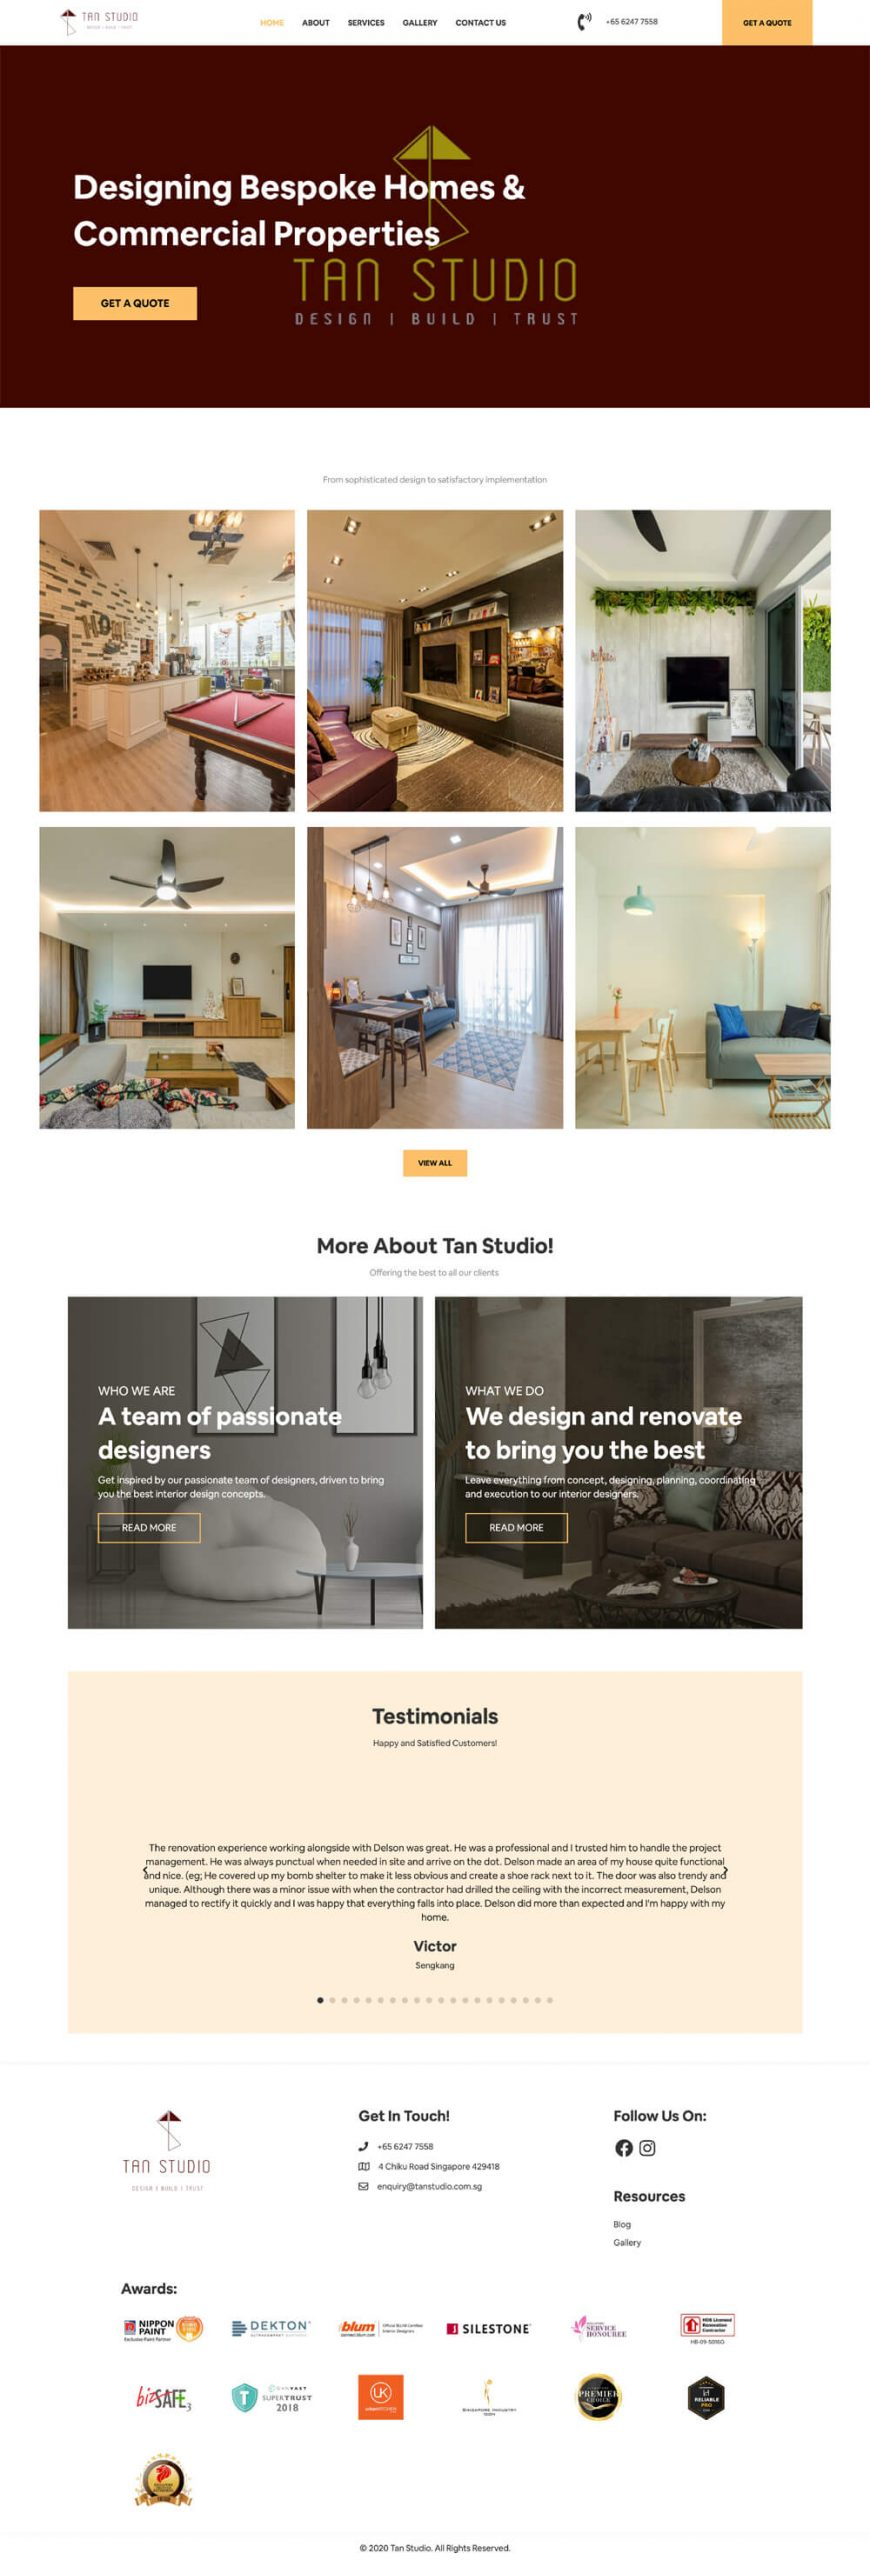 Tan Studio Homepage